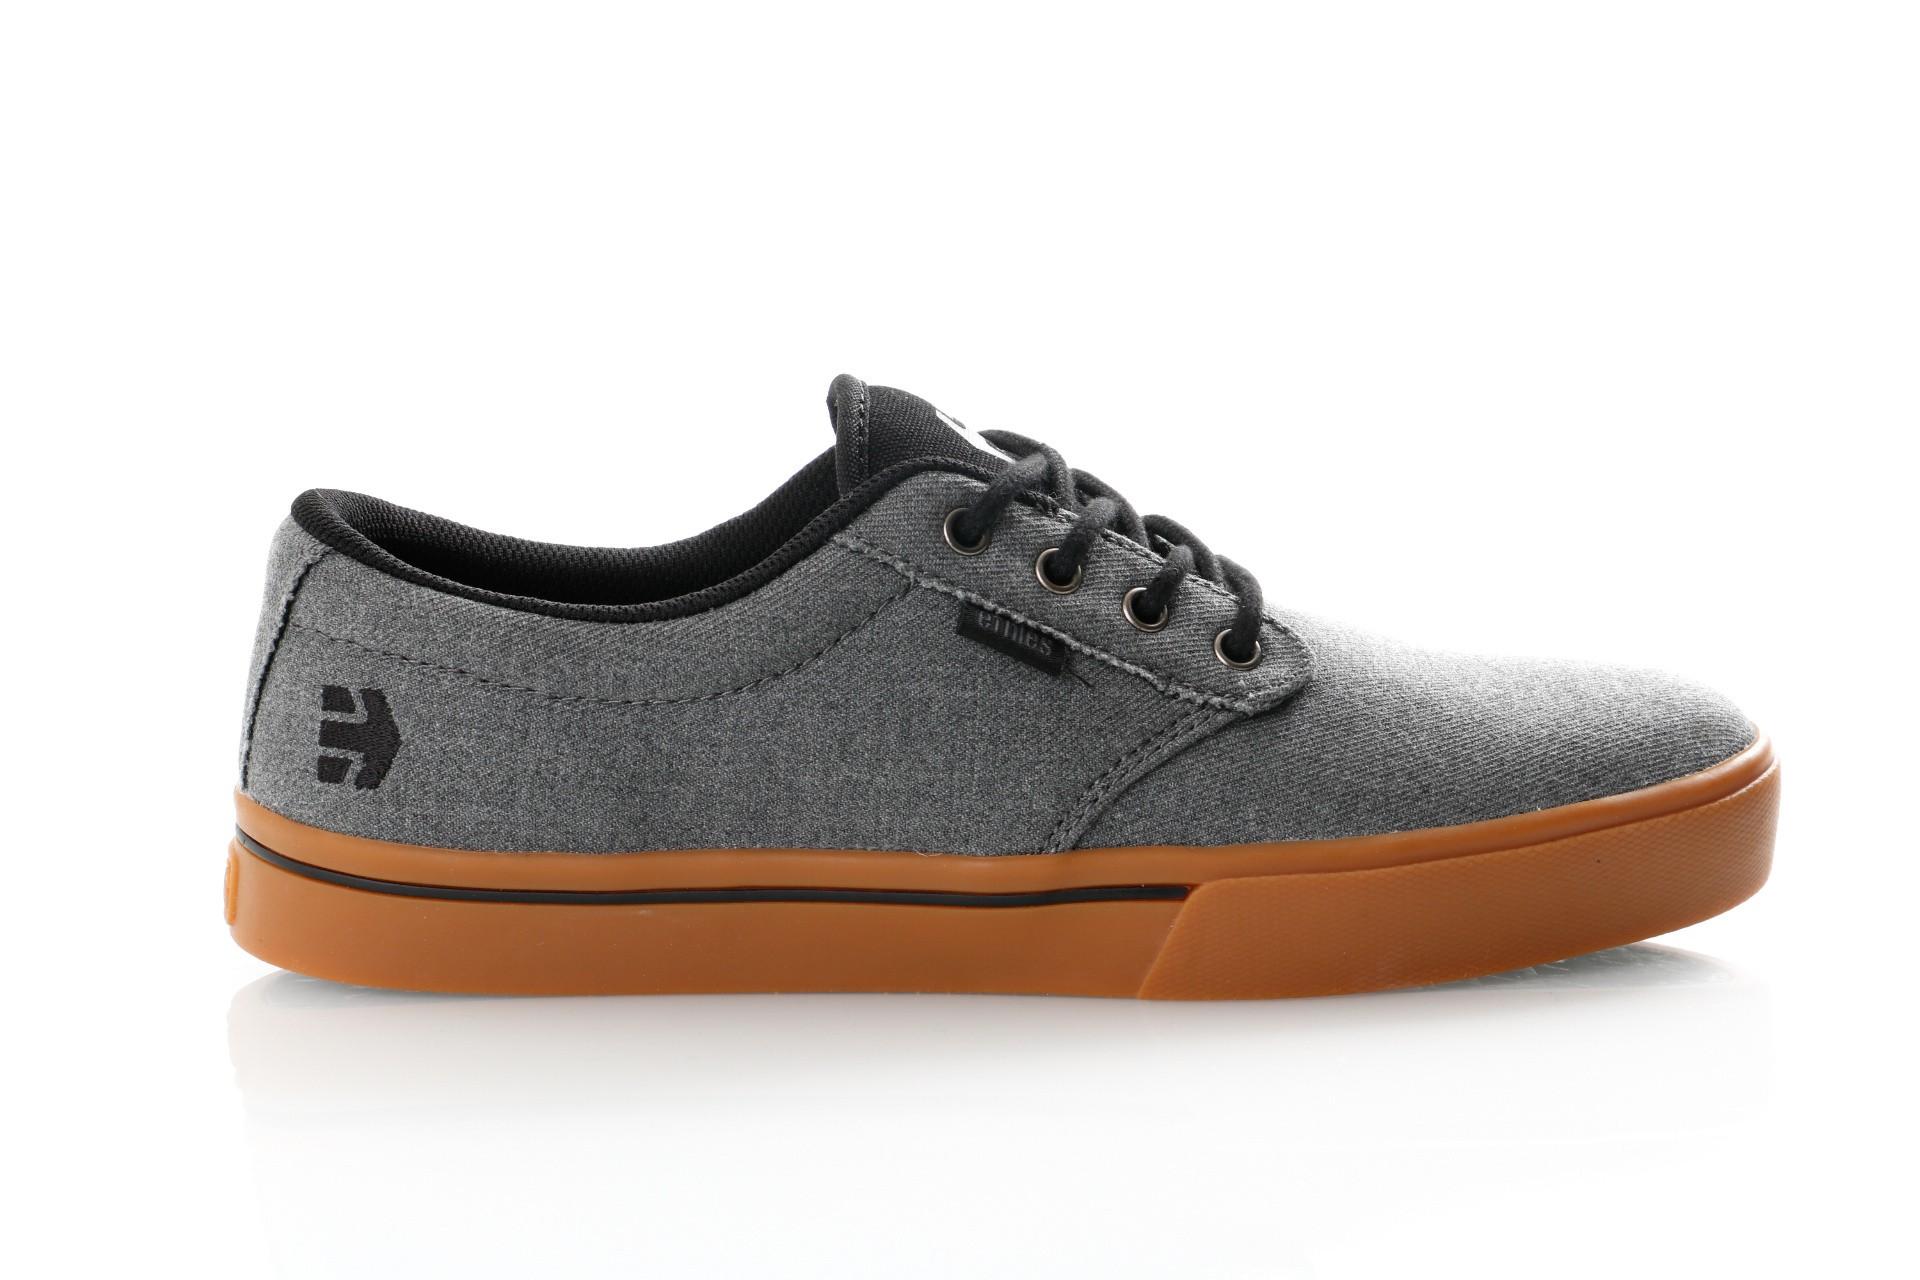 Foto van Etnies Jameson 2 Eco 4101000323 Sneakers Grey/Black/Orange